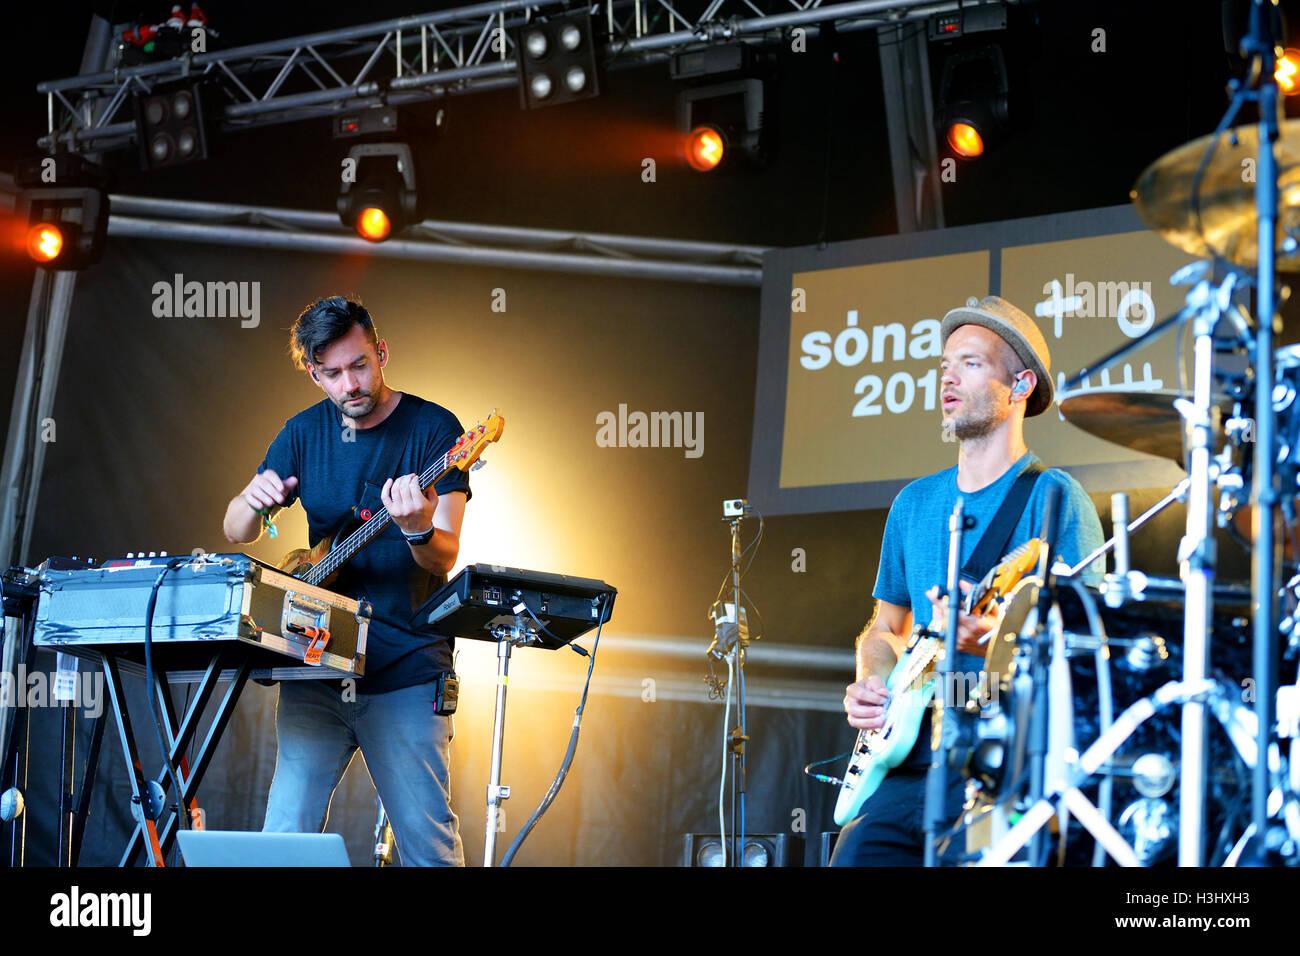 BARCELONA - JUN 13: Bonobo (musician, producer and DJ) performance at Sonar Festival on June 13, 2014 in Barcelona, - Stock Image